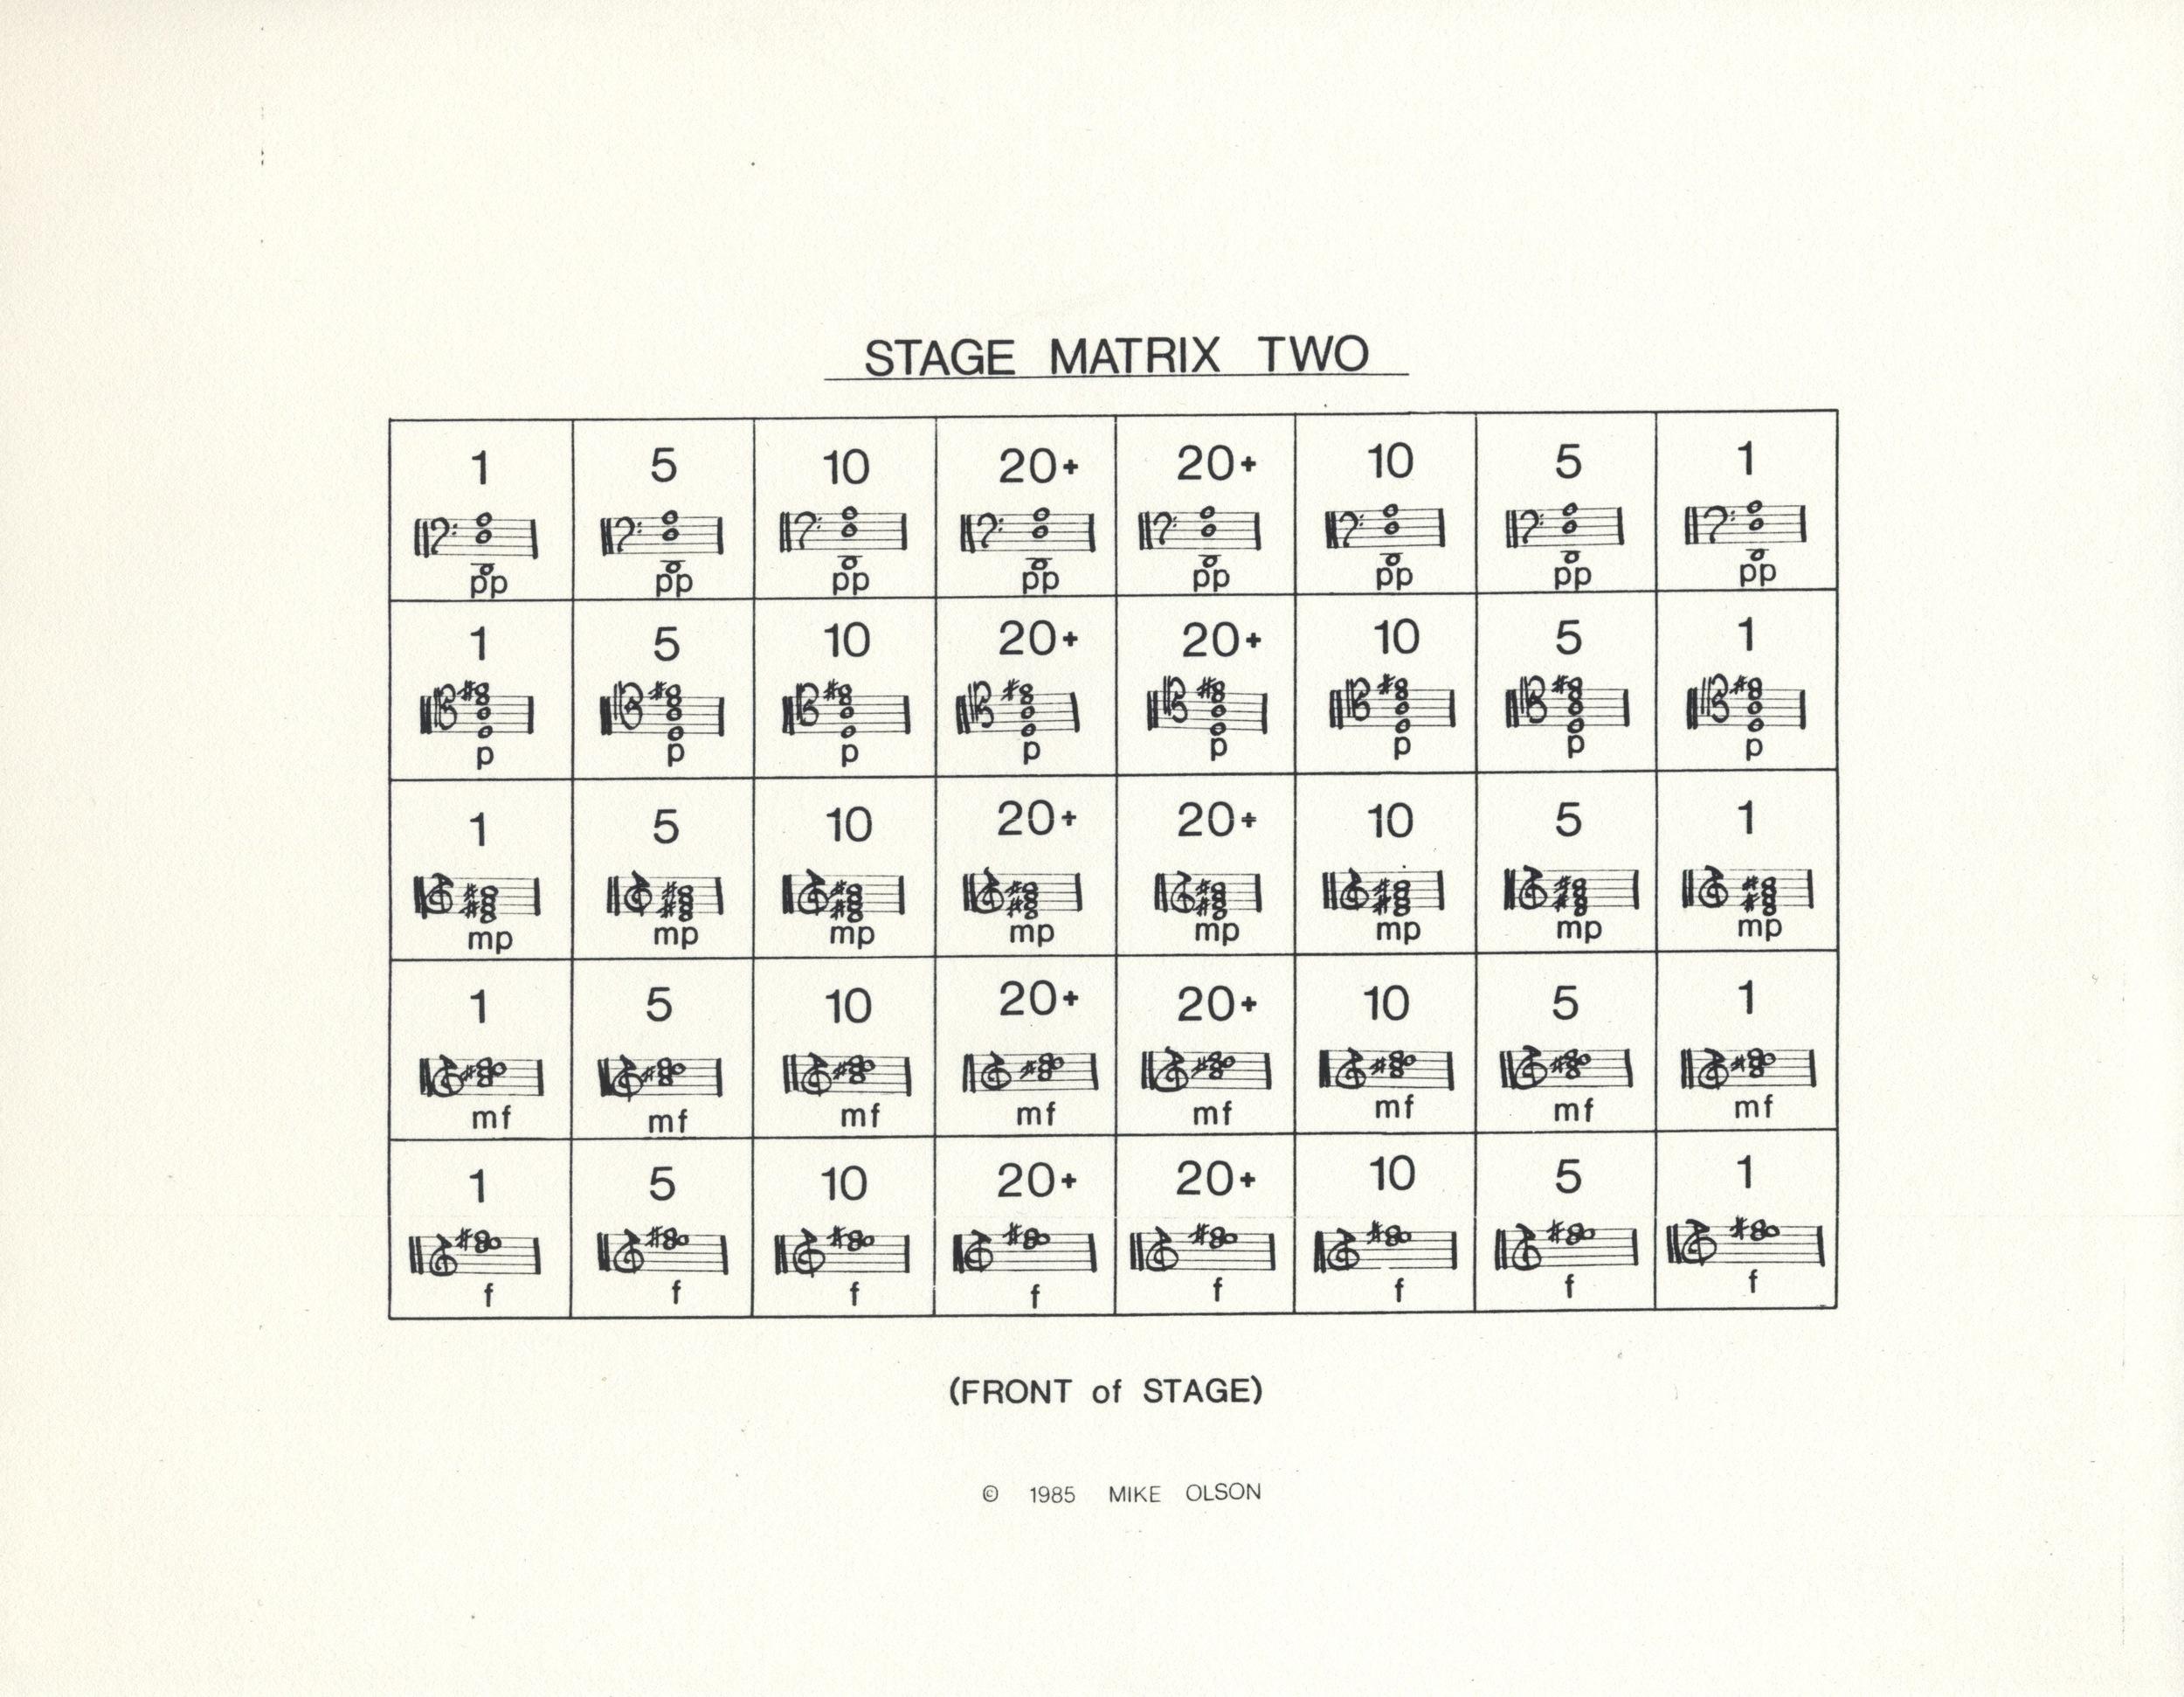 Stage Matrix 2